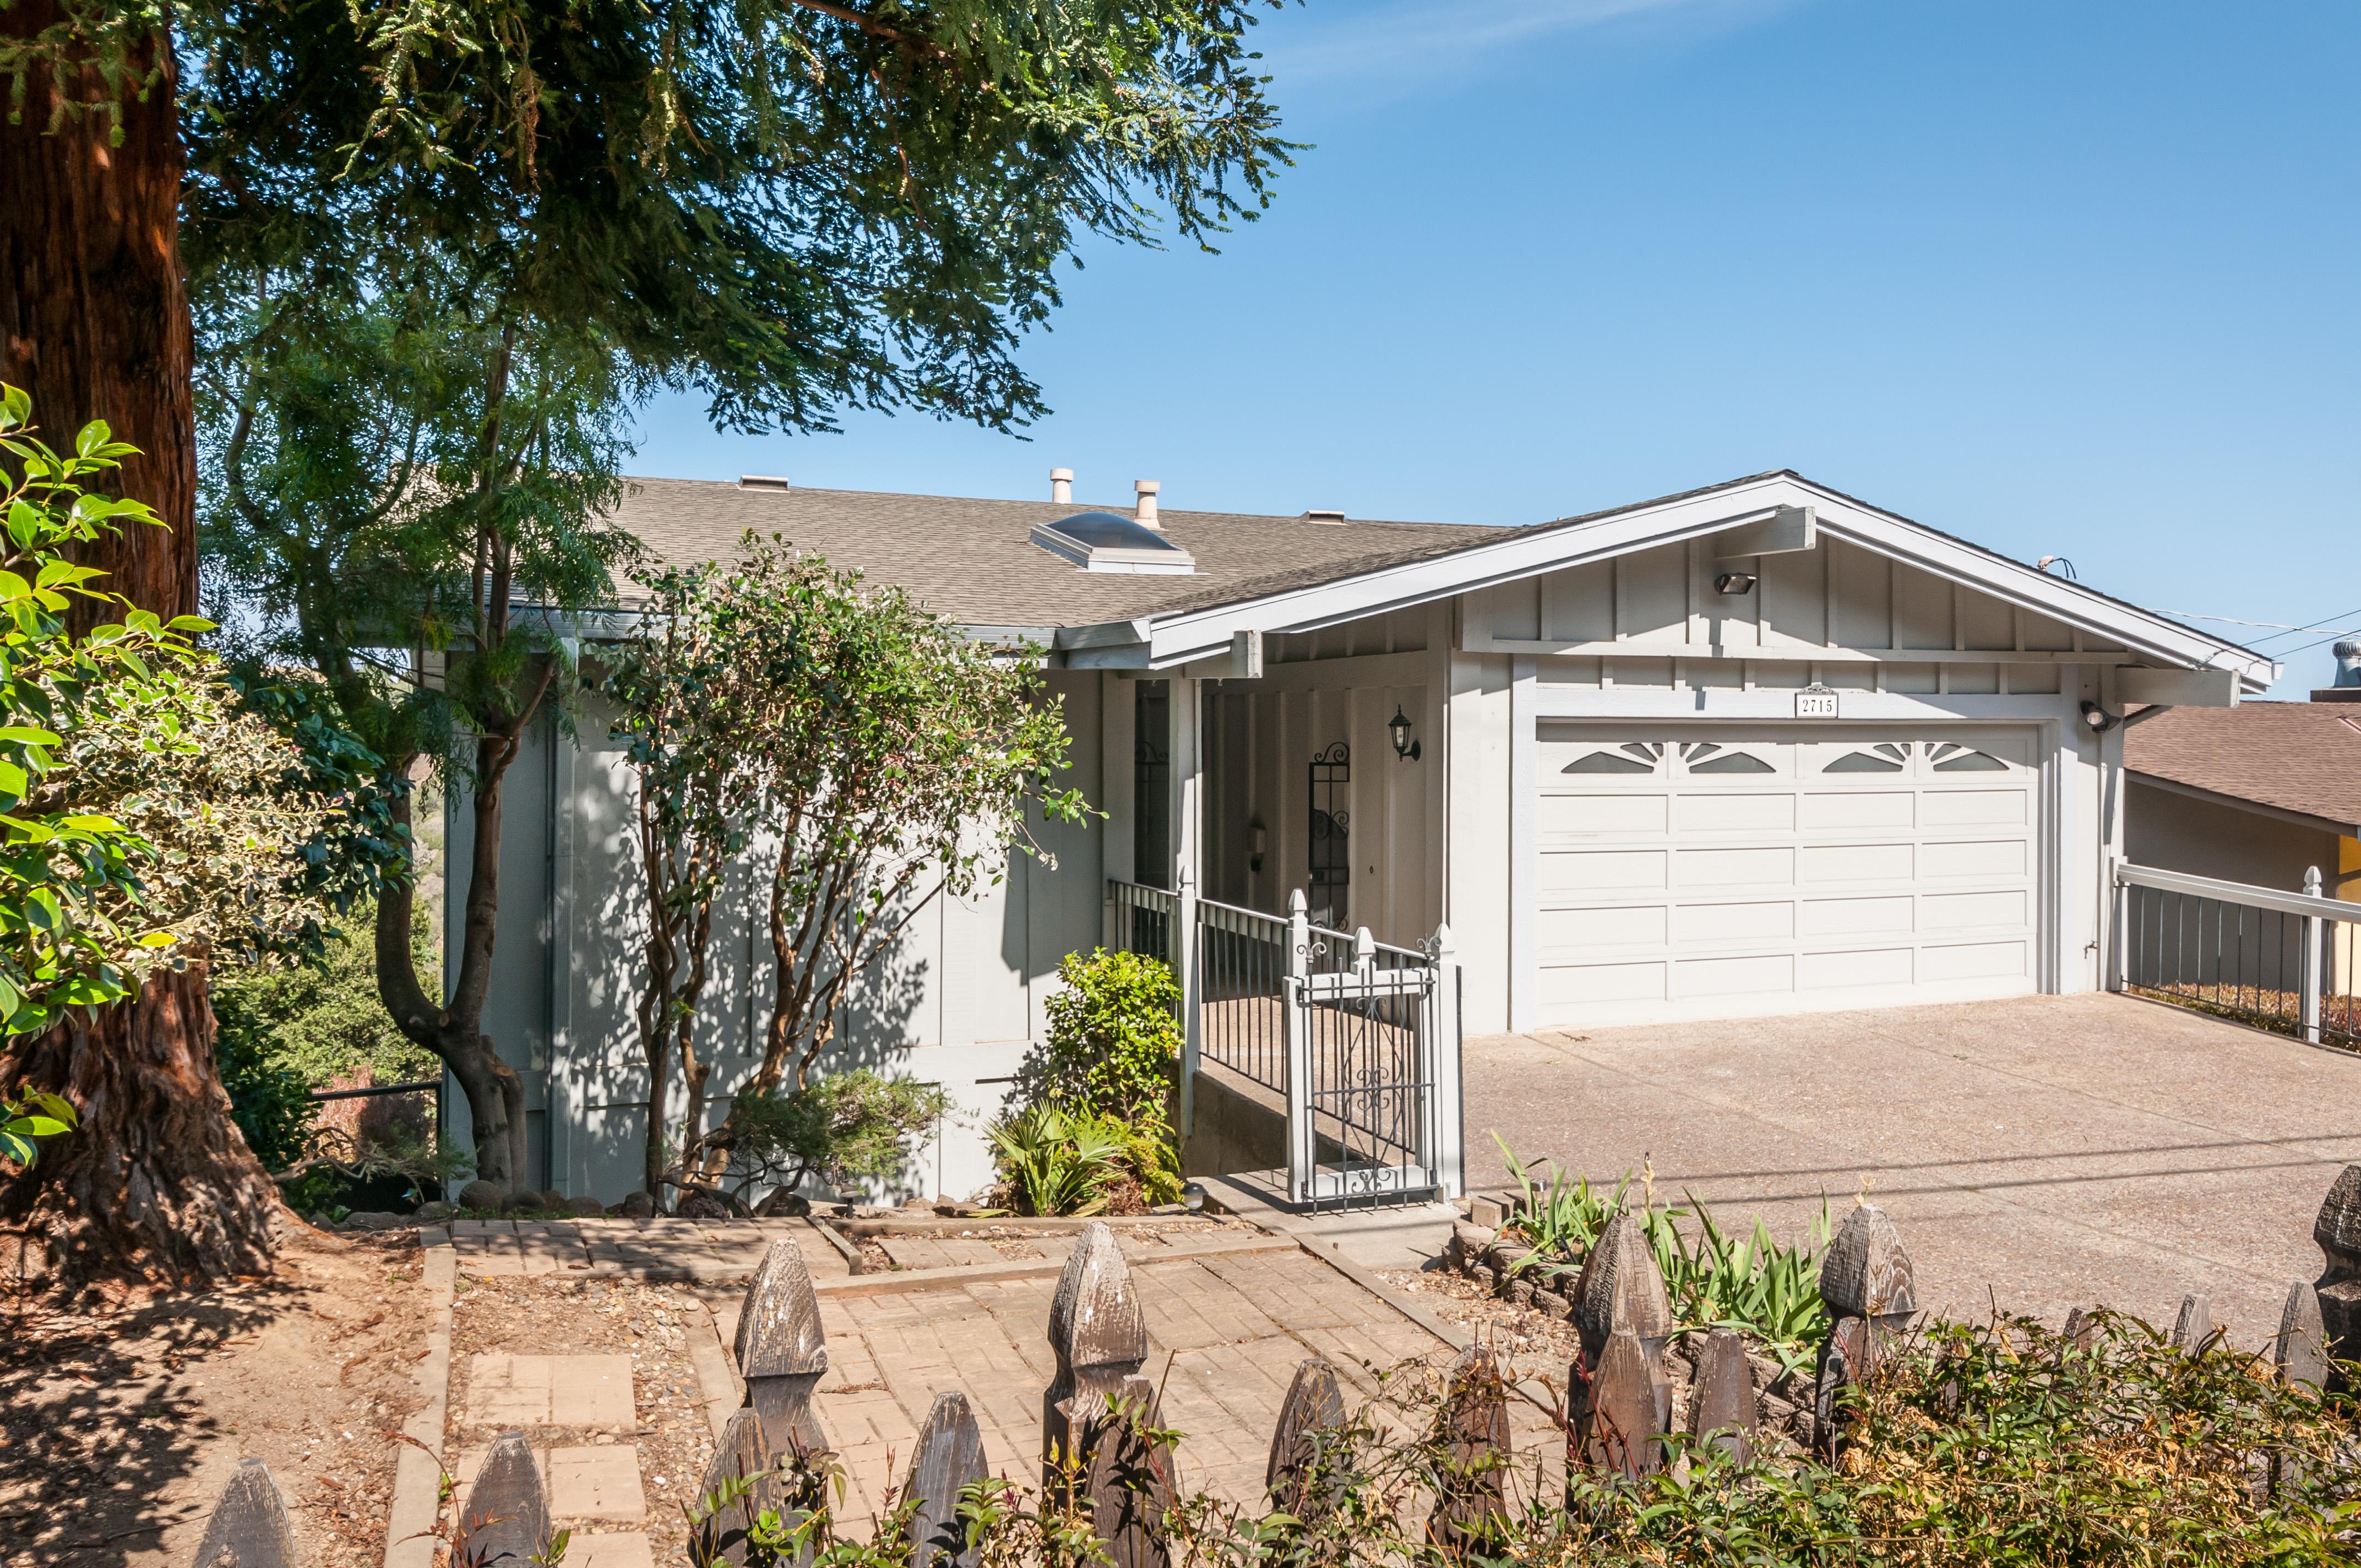 2715 Sequoia Way, Belmont, CA 94002